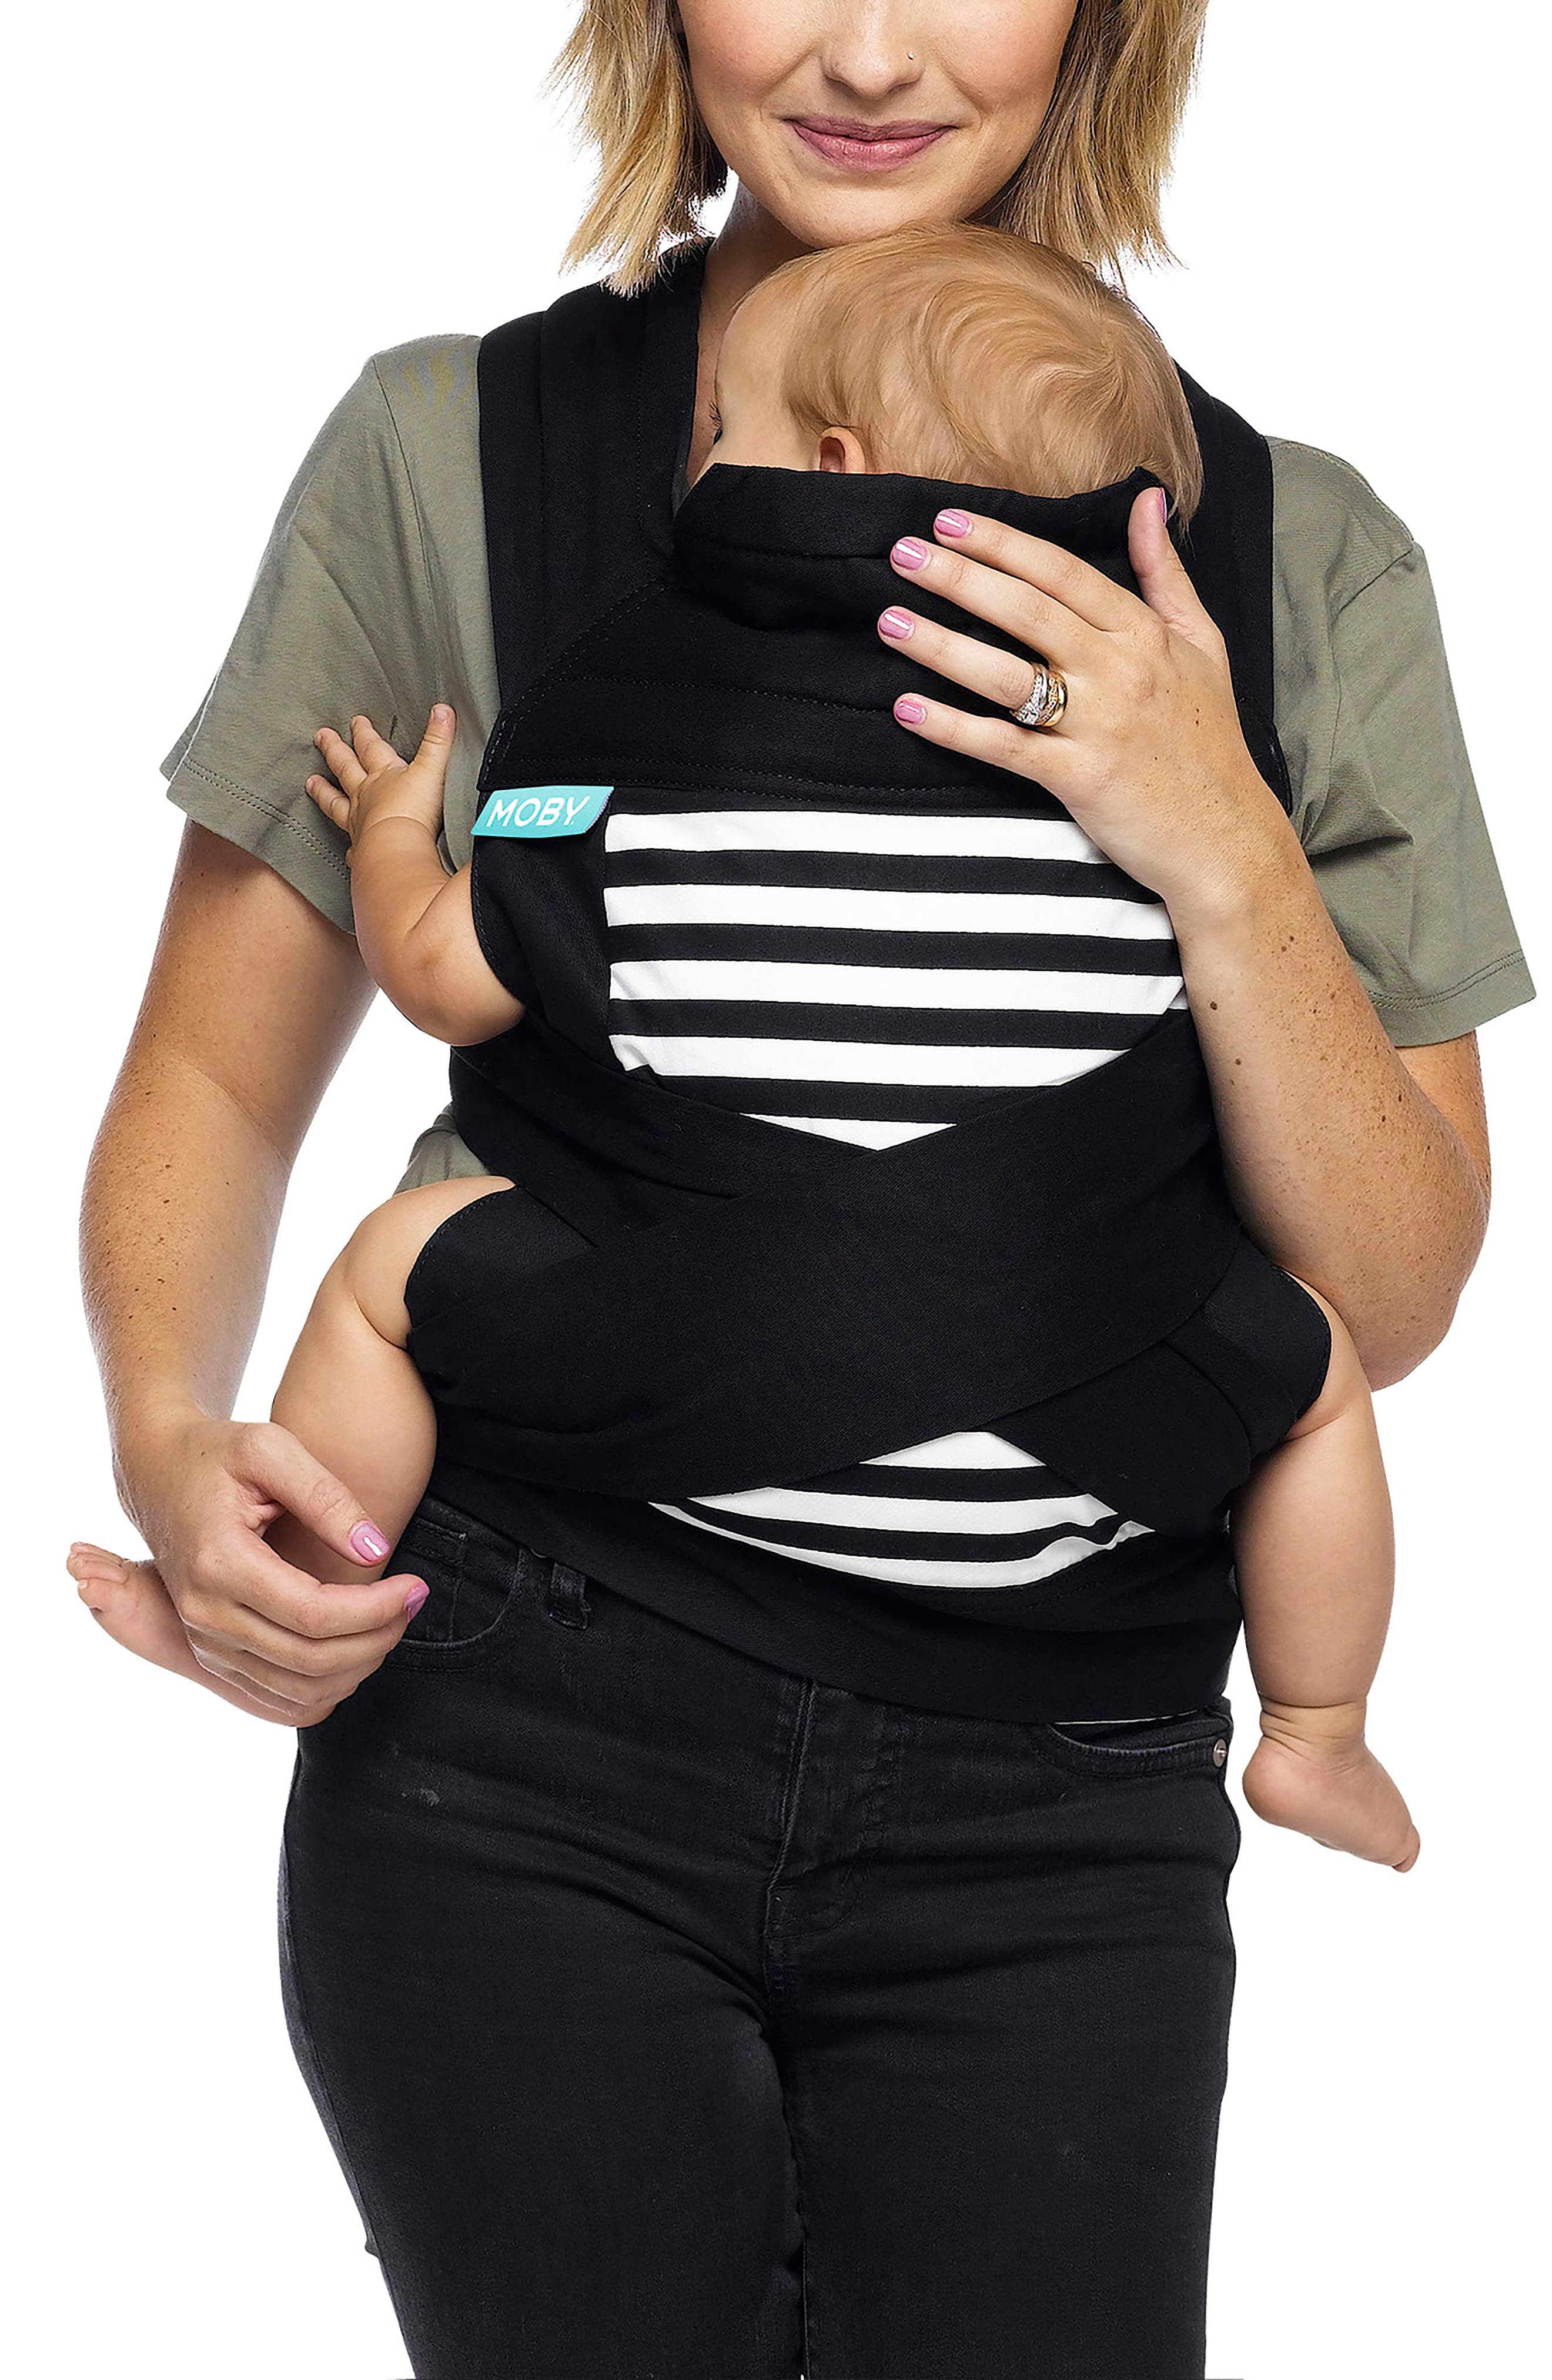 Wrap Double Tie Baby Carrier,                             Main thumbnail 1, color,                             001